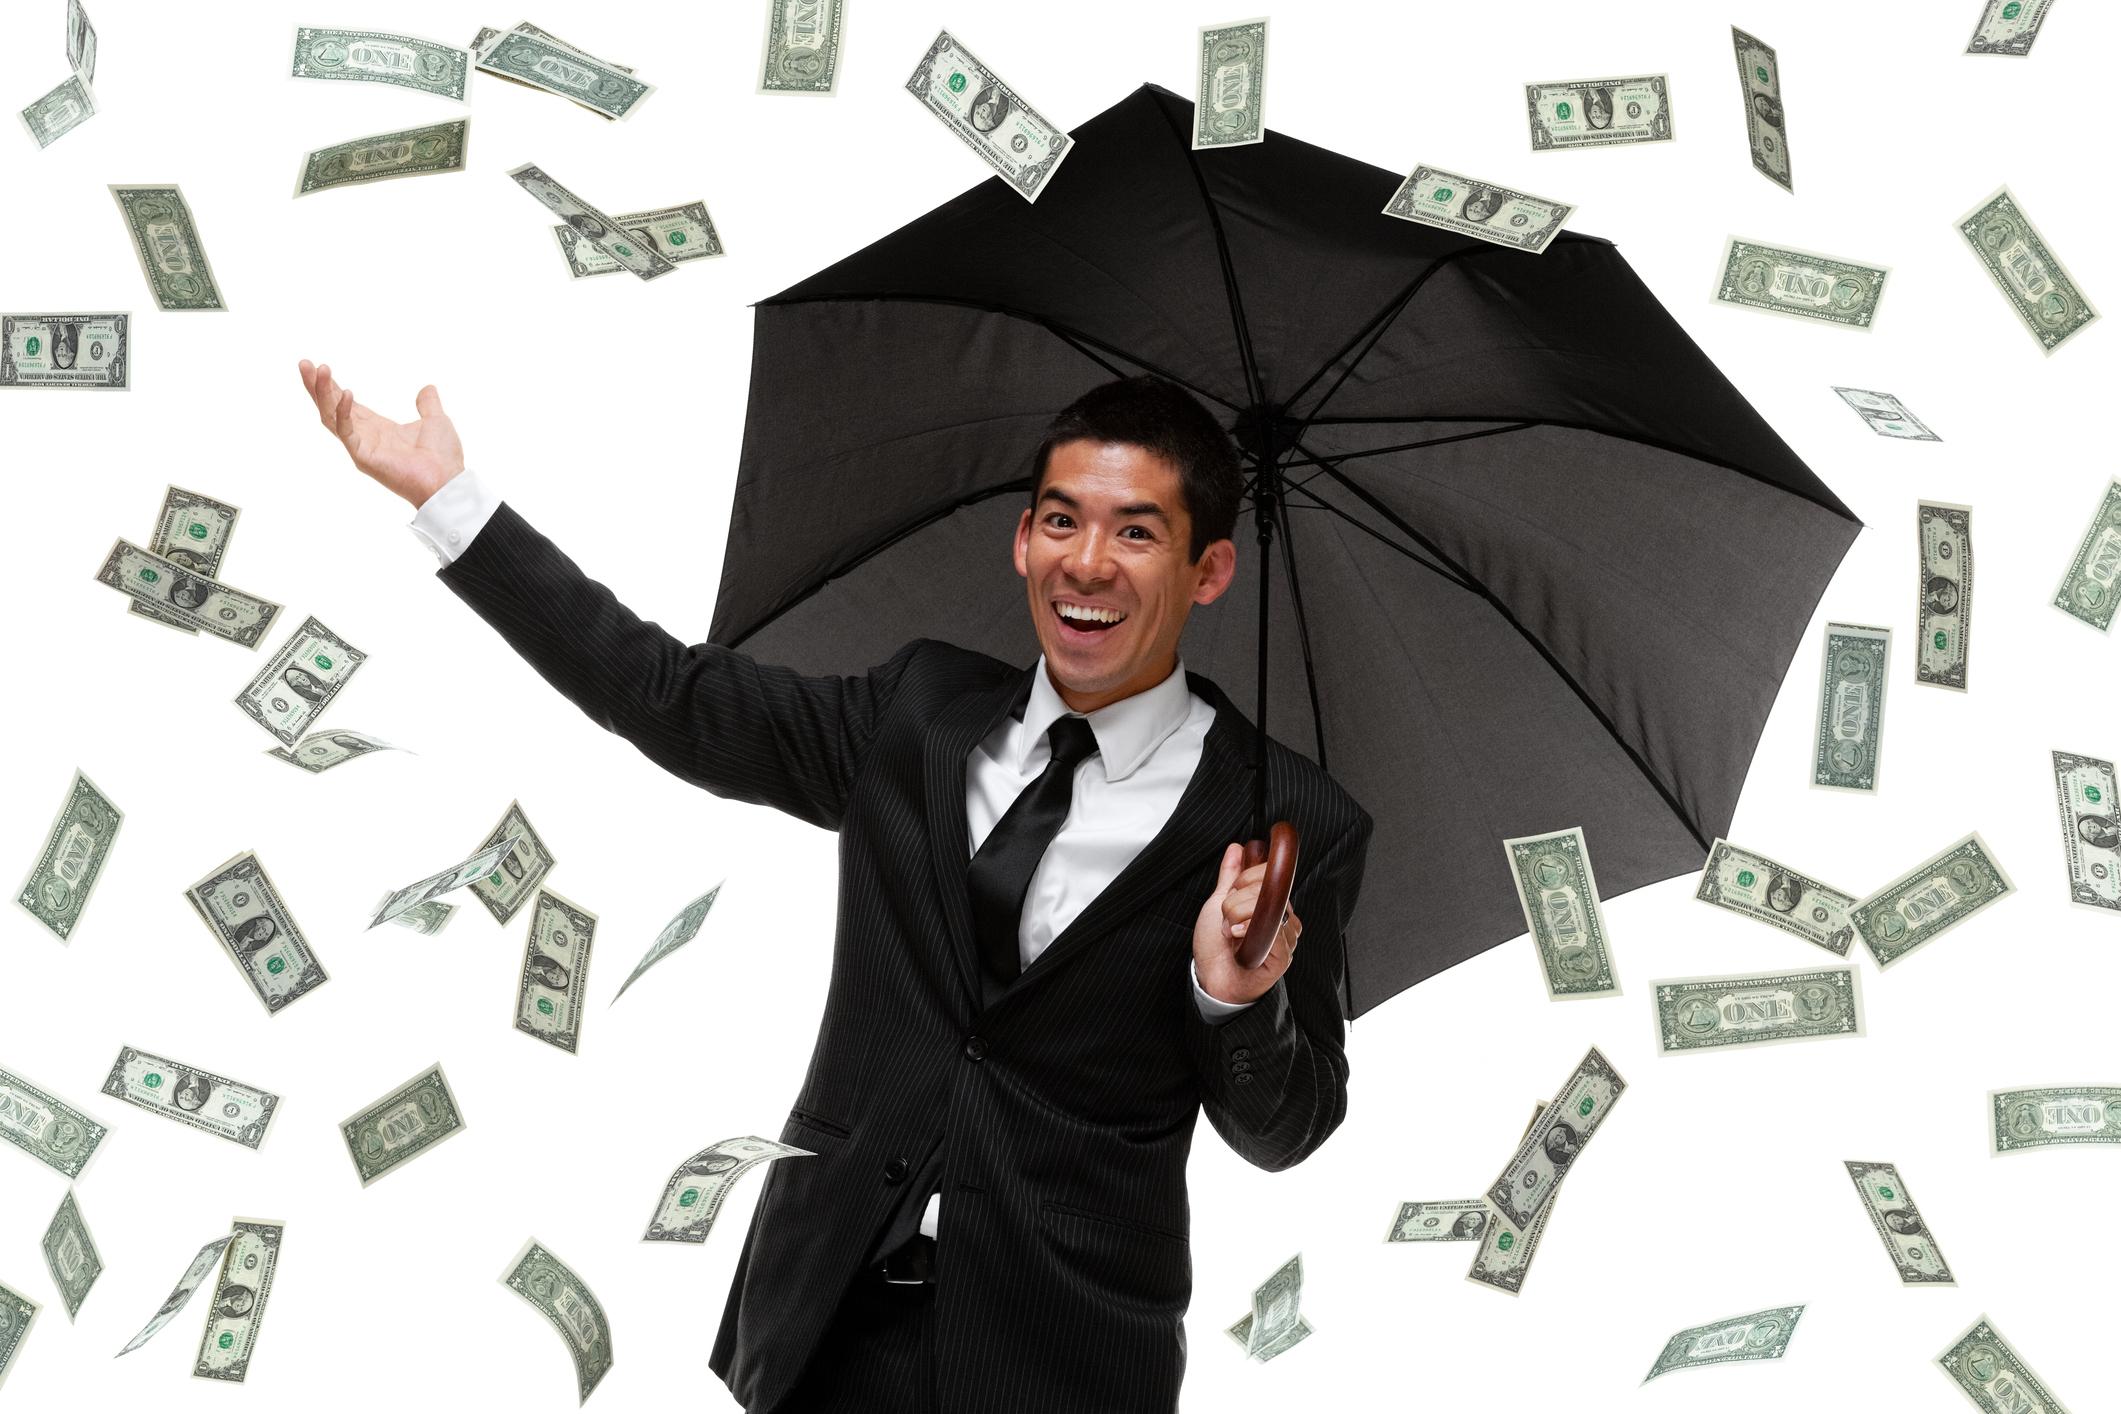 Money raining down on businessman with umbrella.